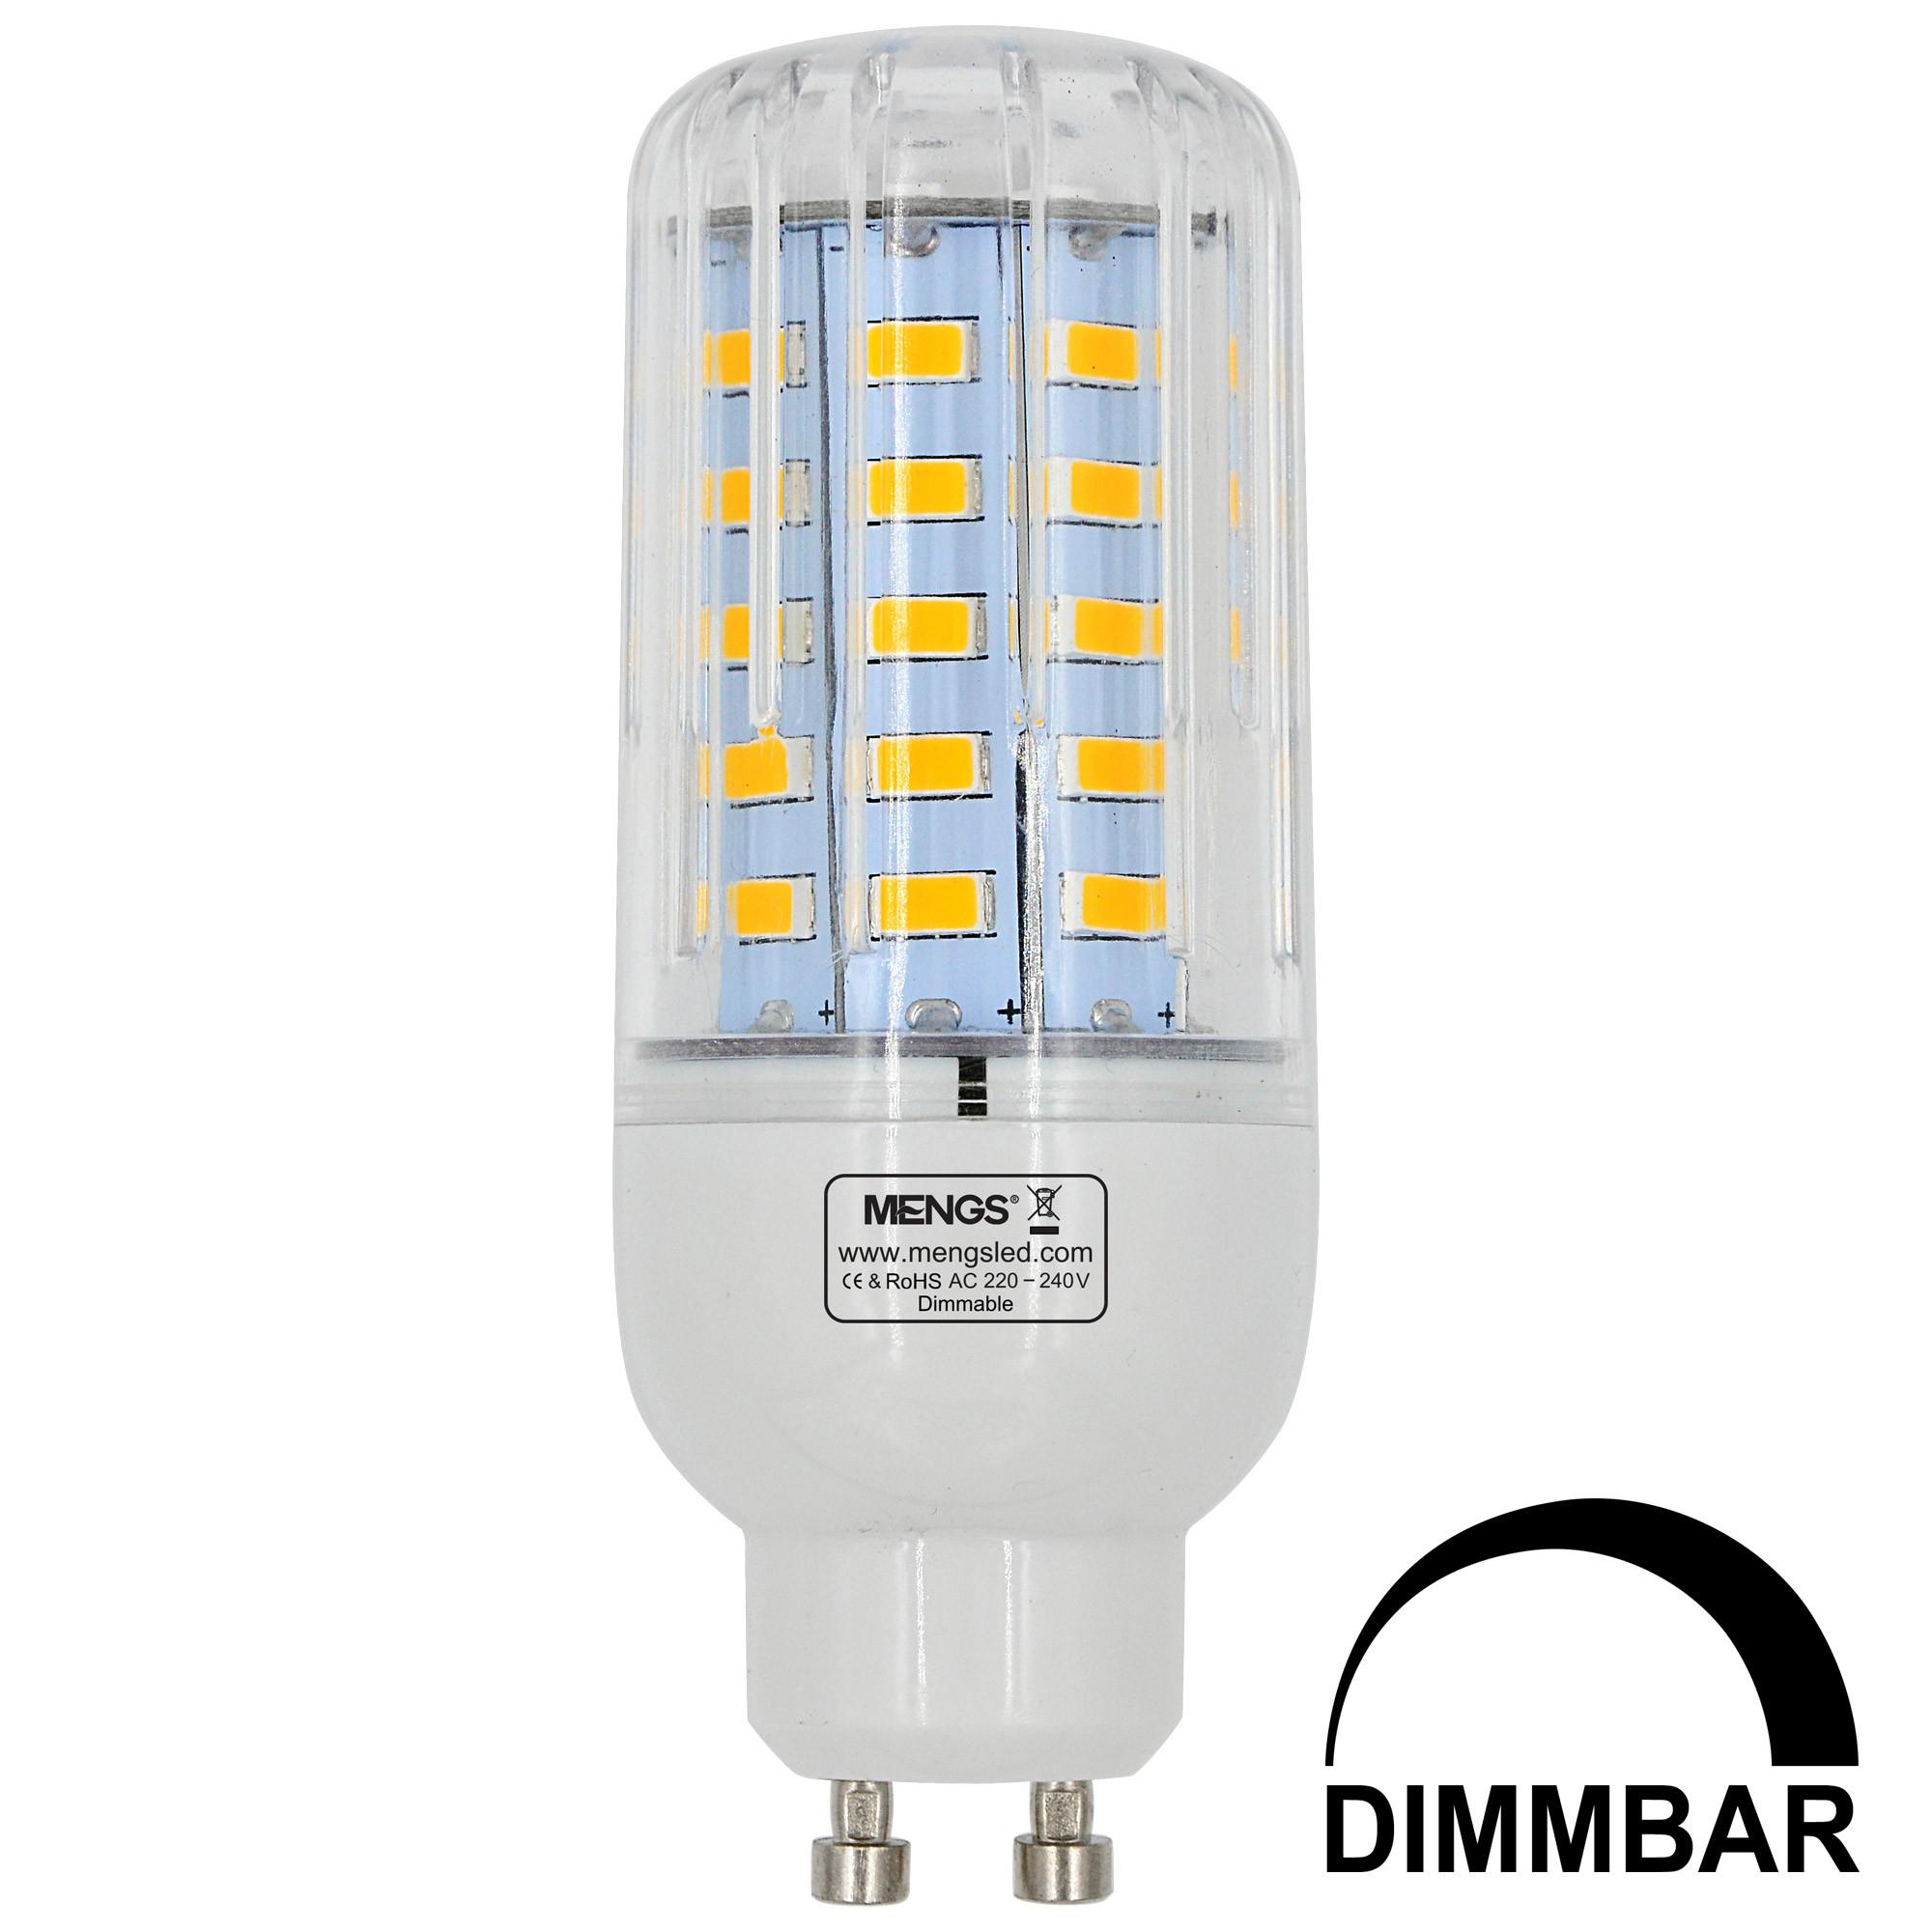 mengsled mengs gu10 7w led dimmable corn light 50x 5736 smd led bulb lamp ac 220 240v in warm. Black Bedroom Furniture Sets. Home Design Ideas